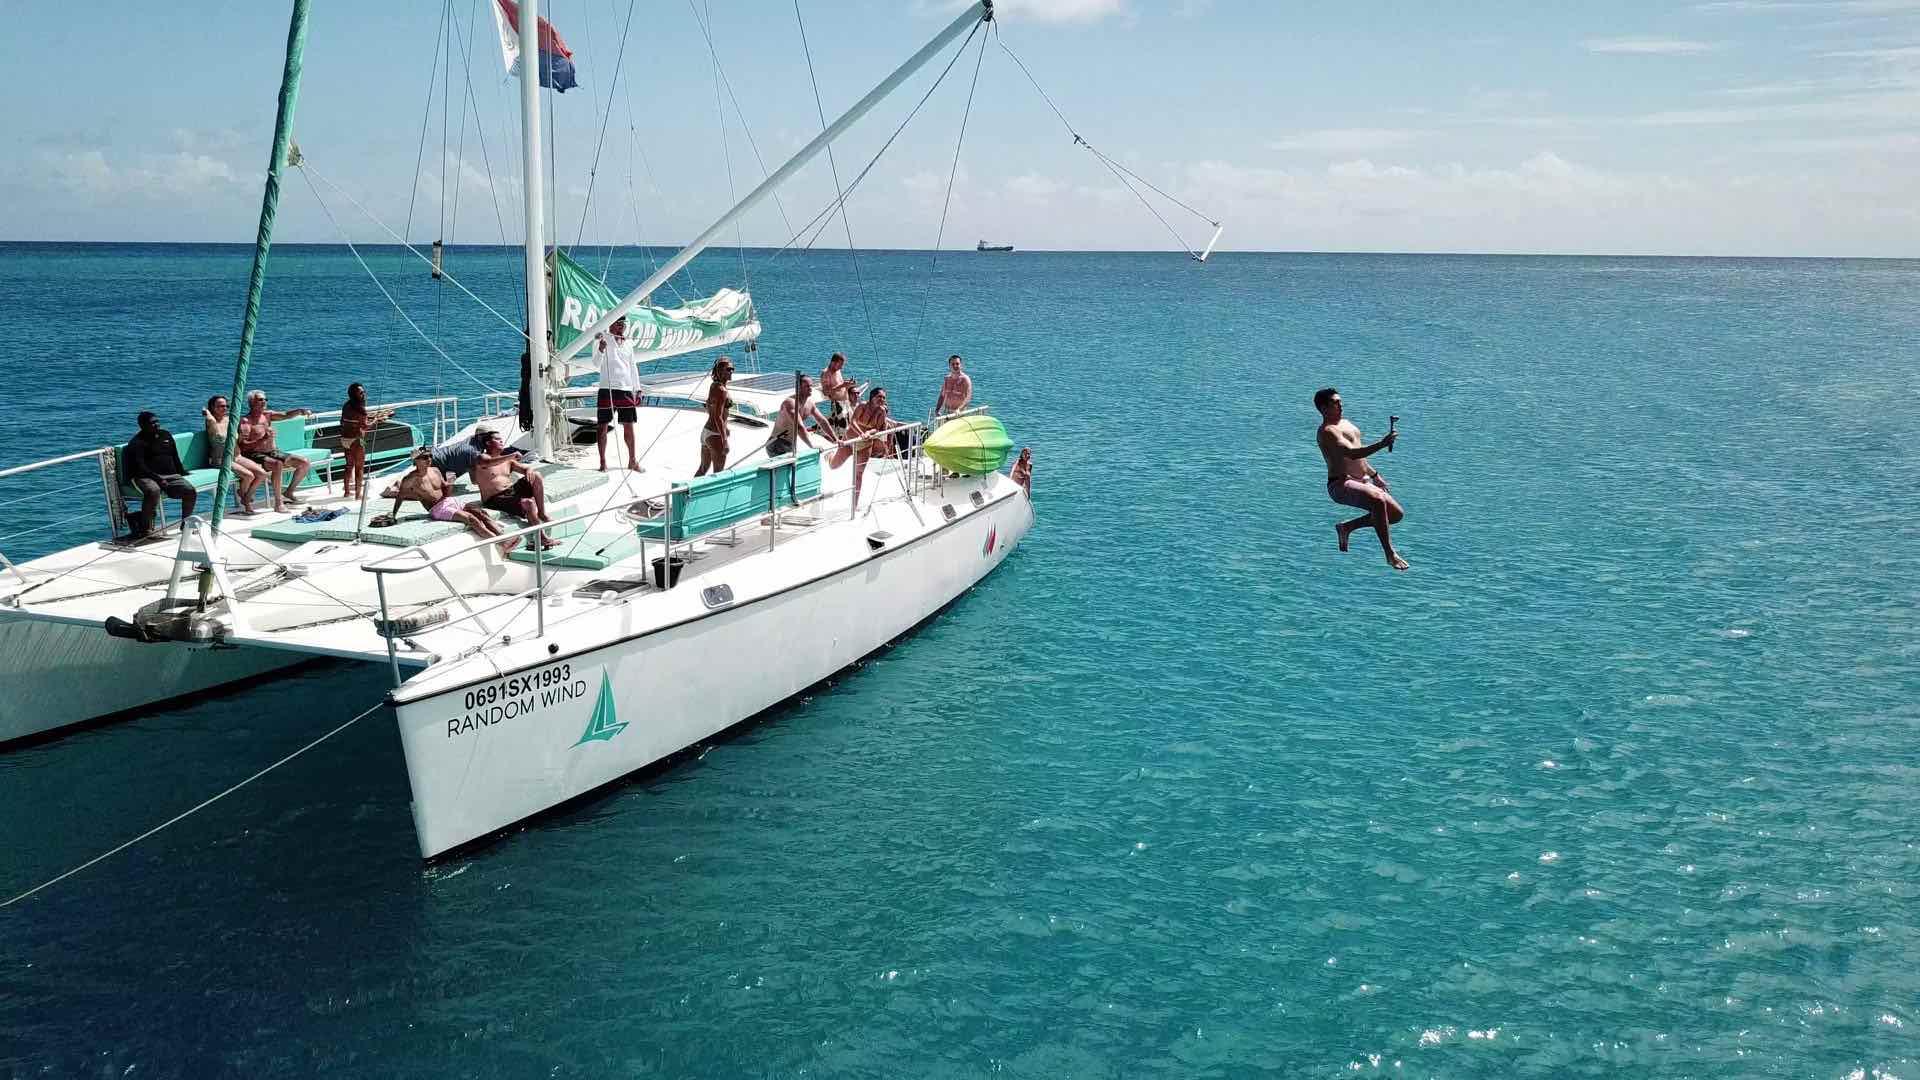 The Tarzan swing with many jumping in water aboard Random Wind Charters yacht